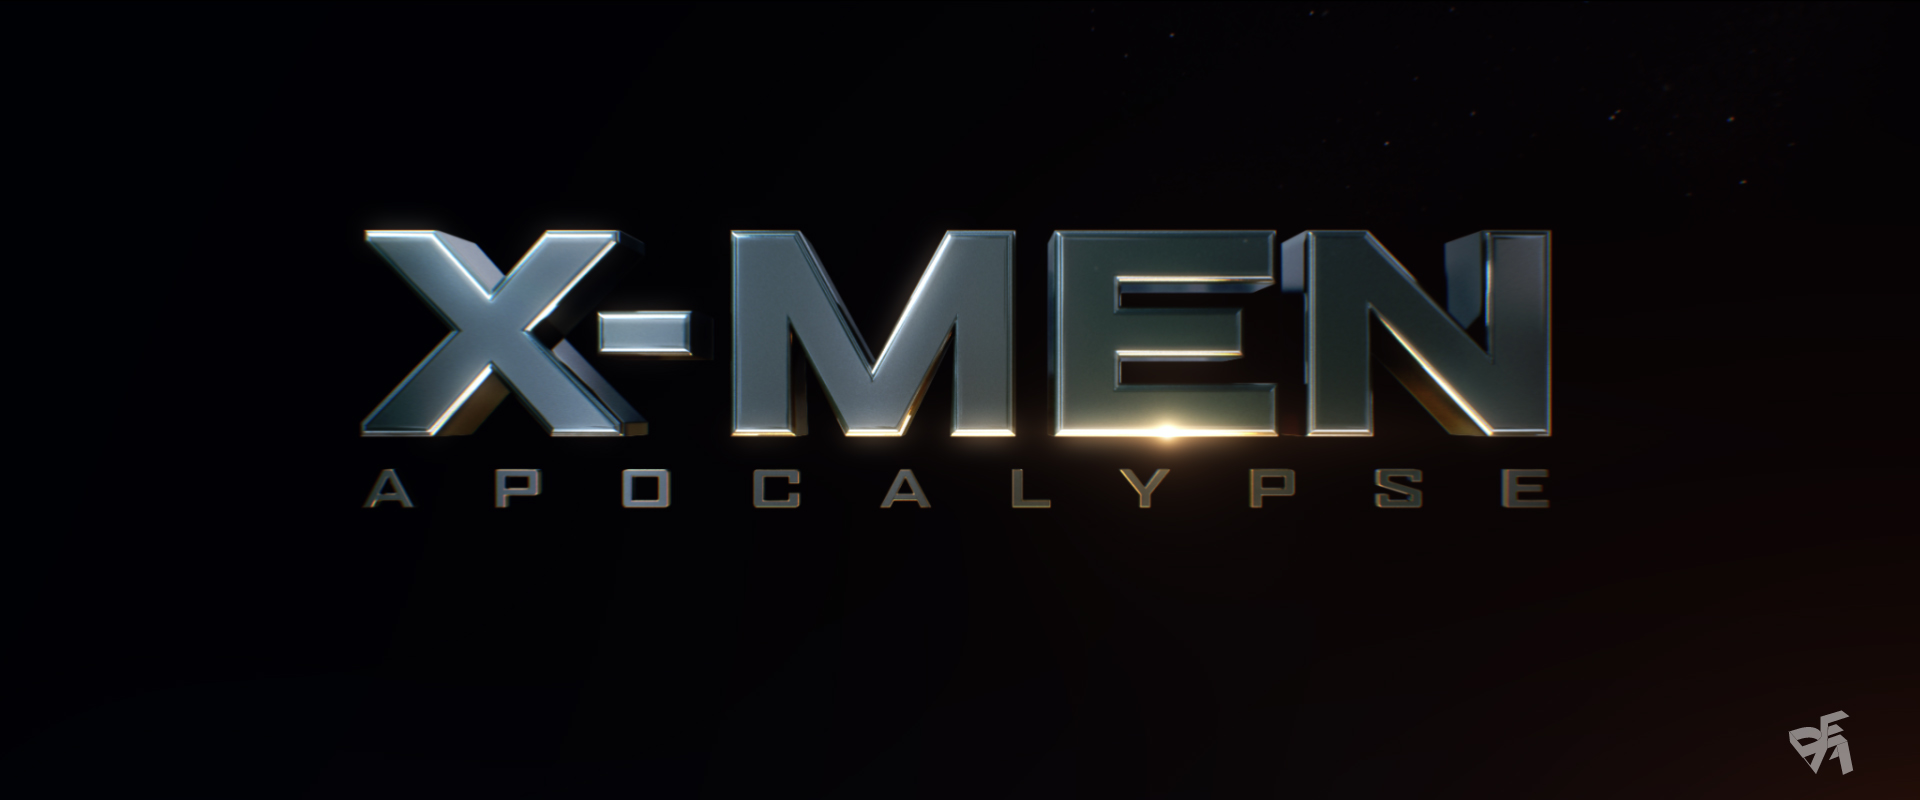 XmenApocalypse-STYLEFRAME_08.jpg